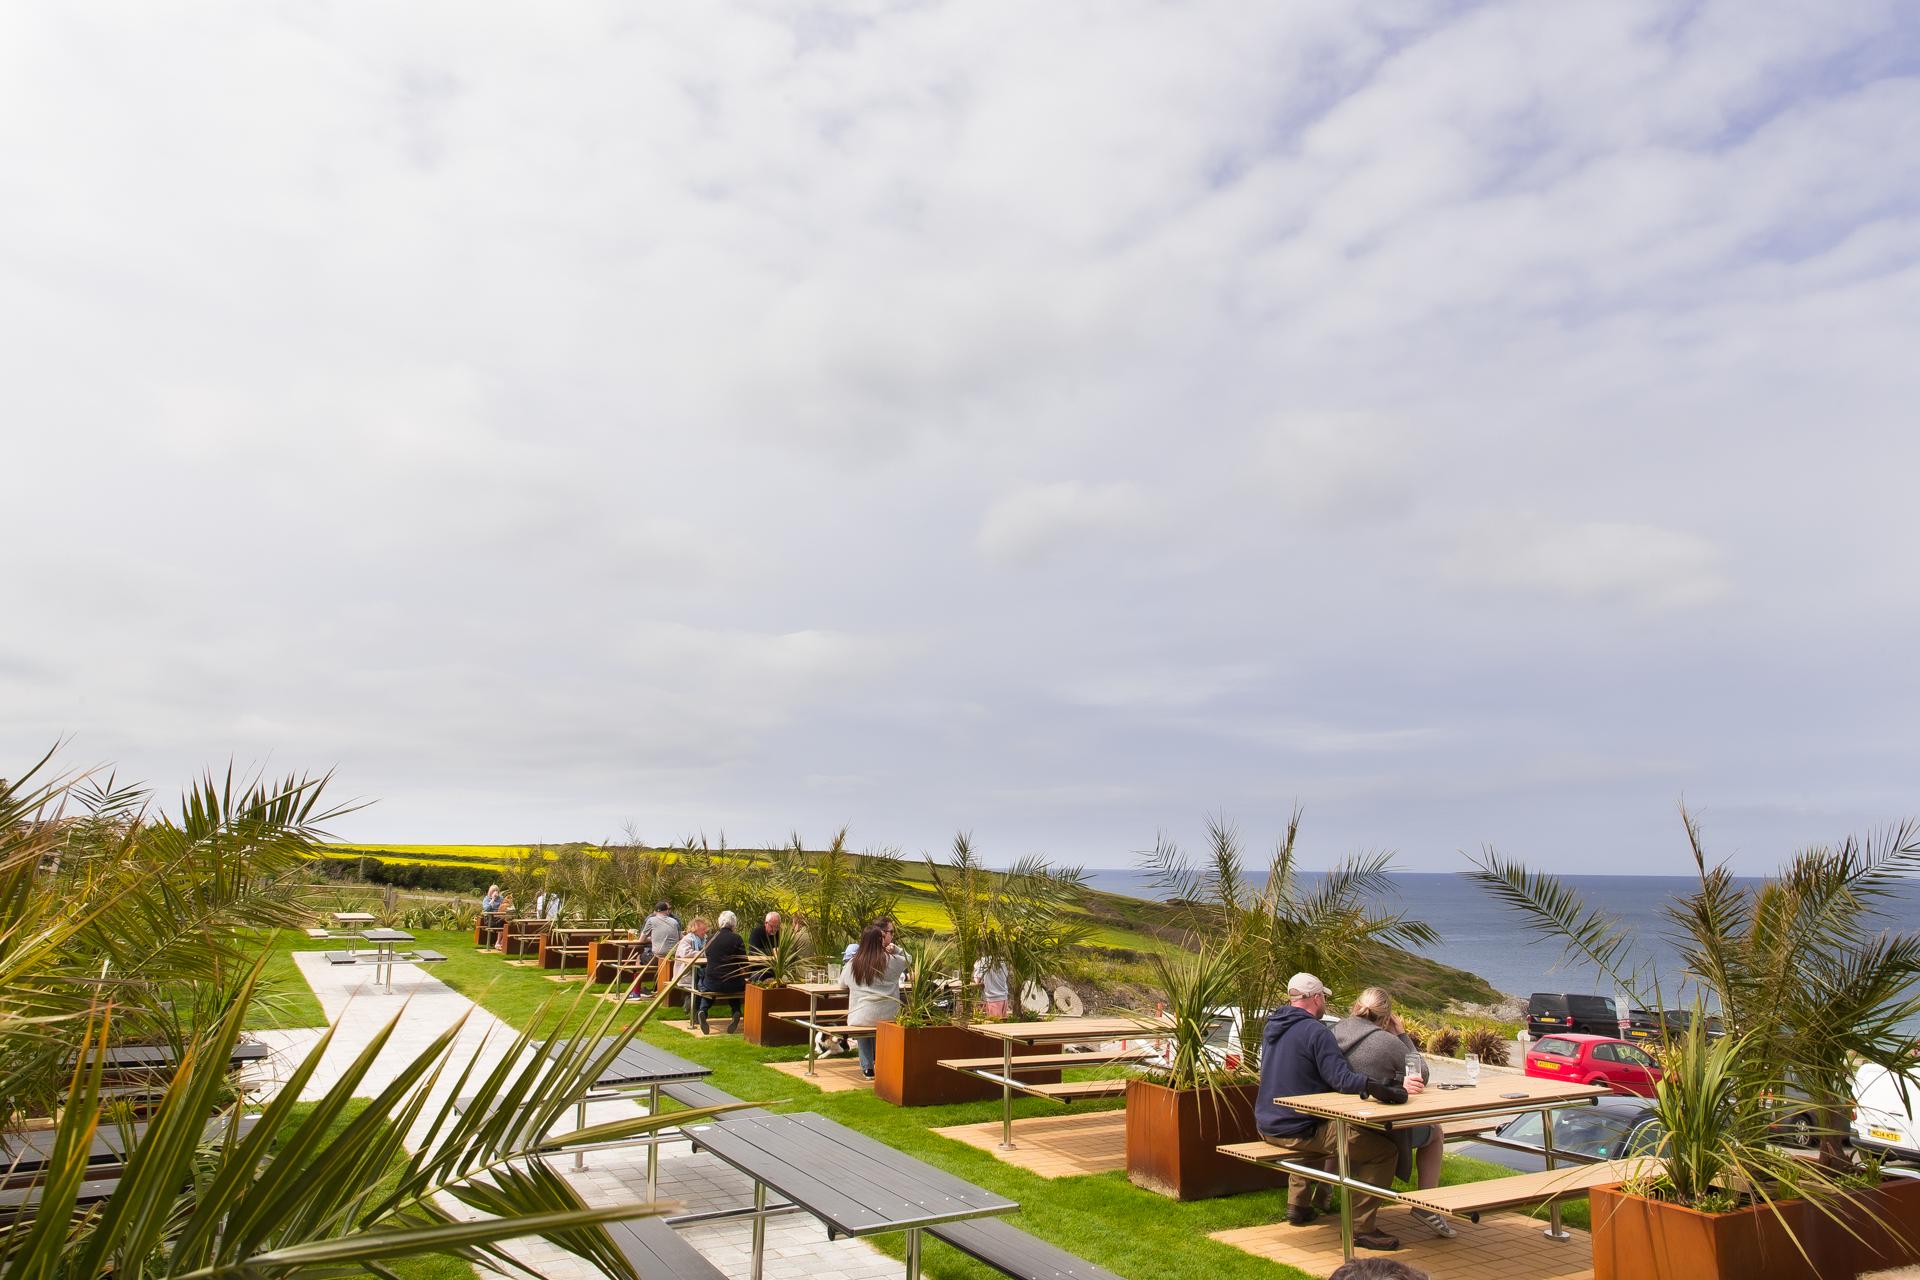 The Bowgie beer garden